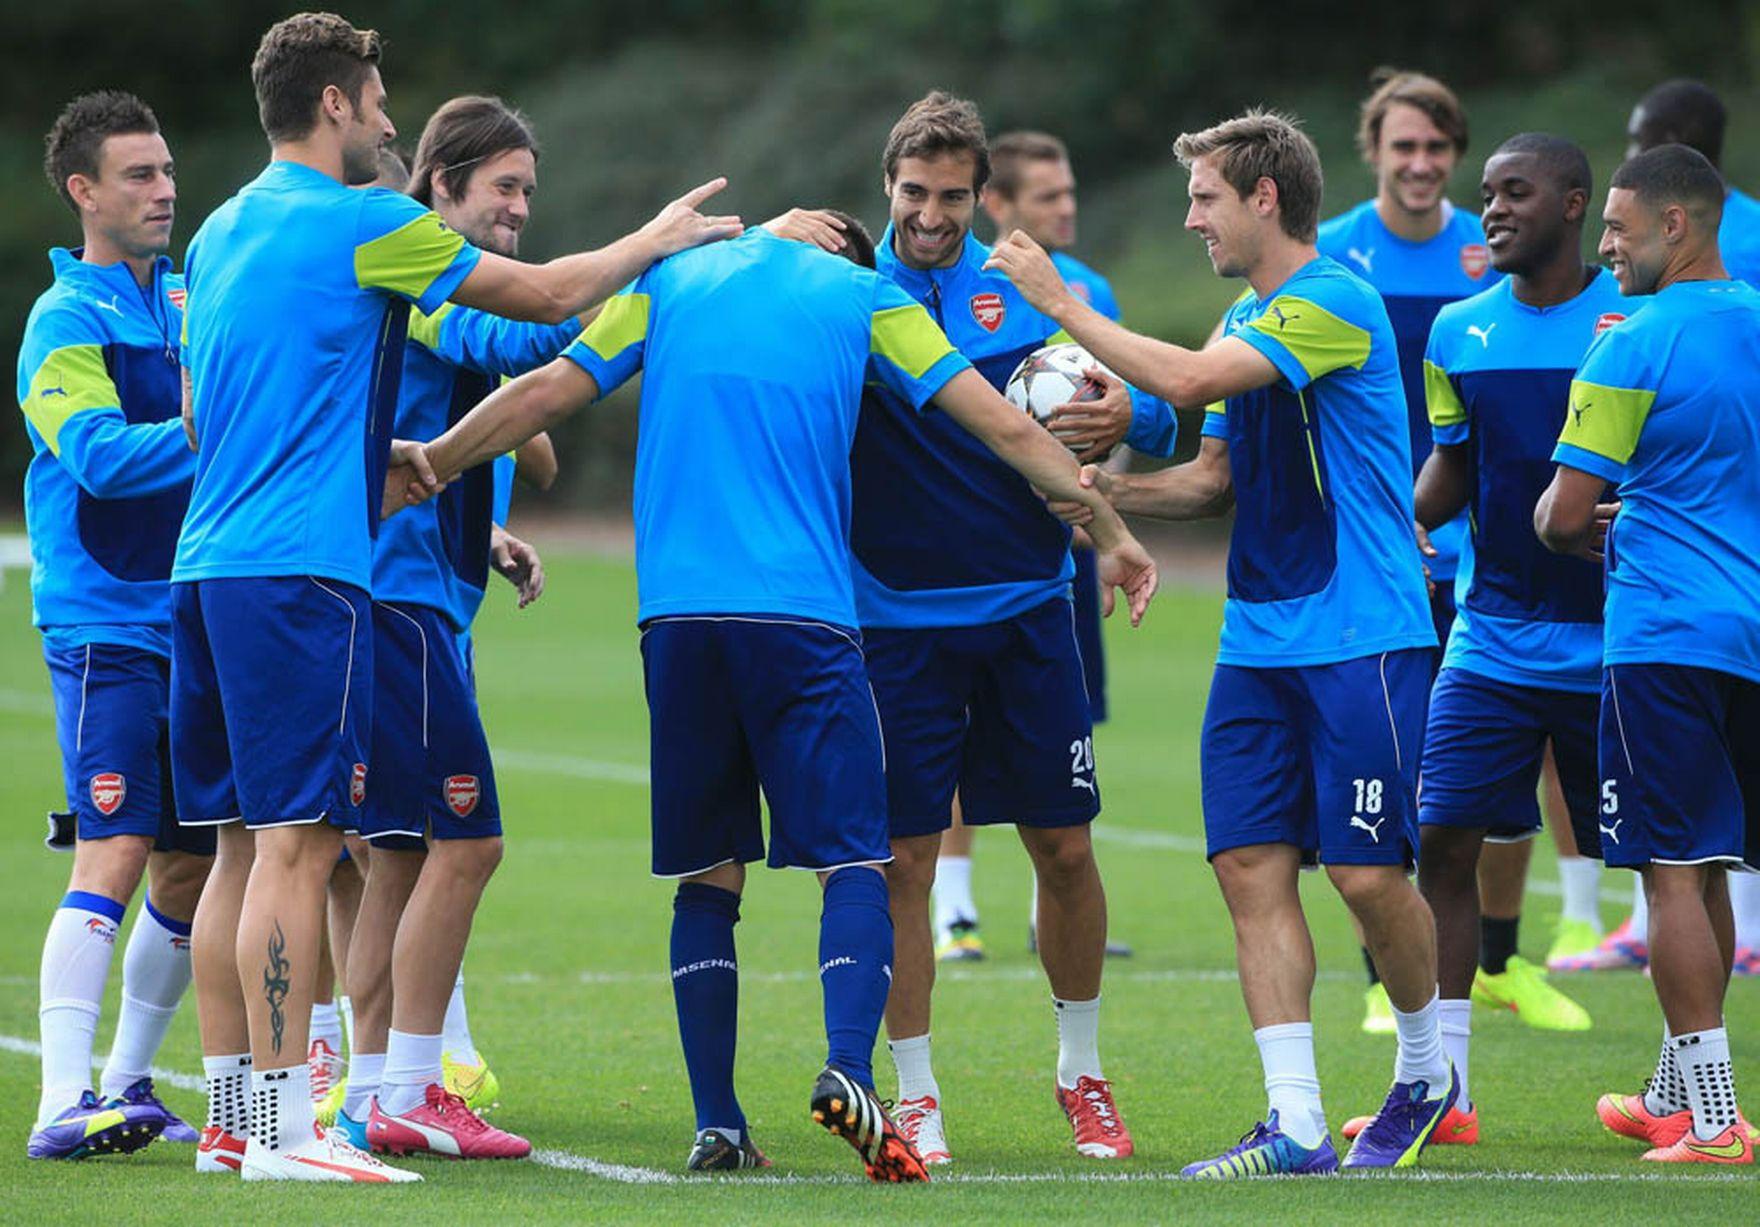 Arsenal-Training-Pics 2